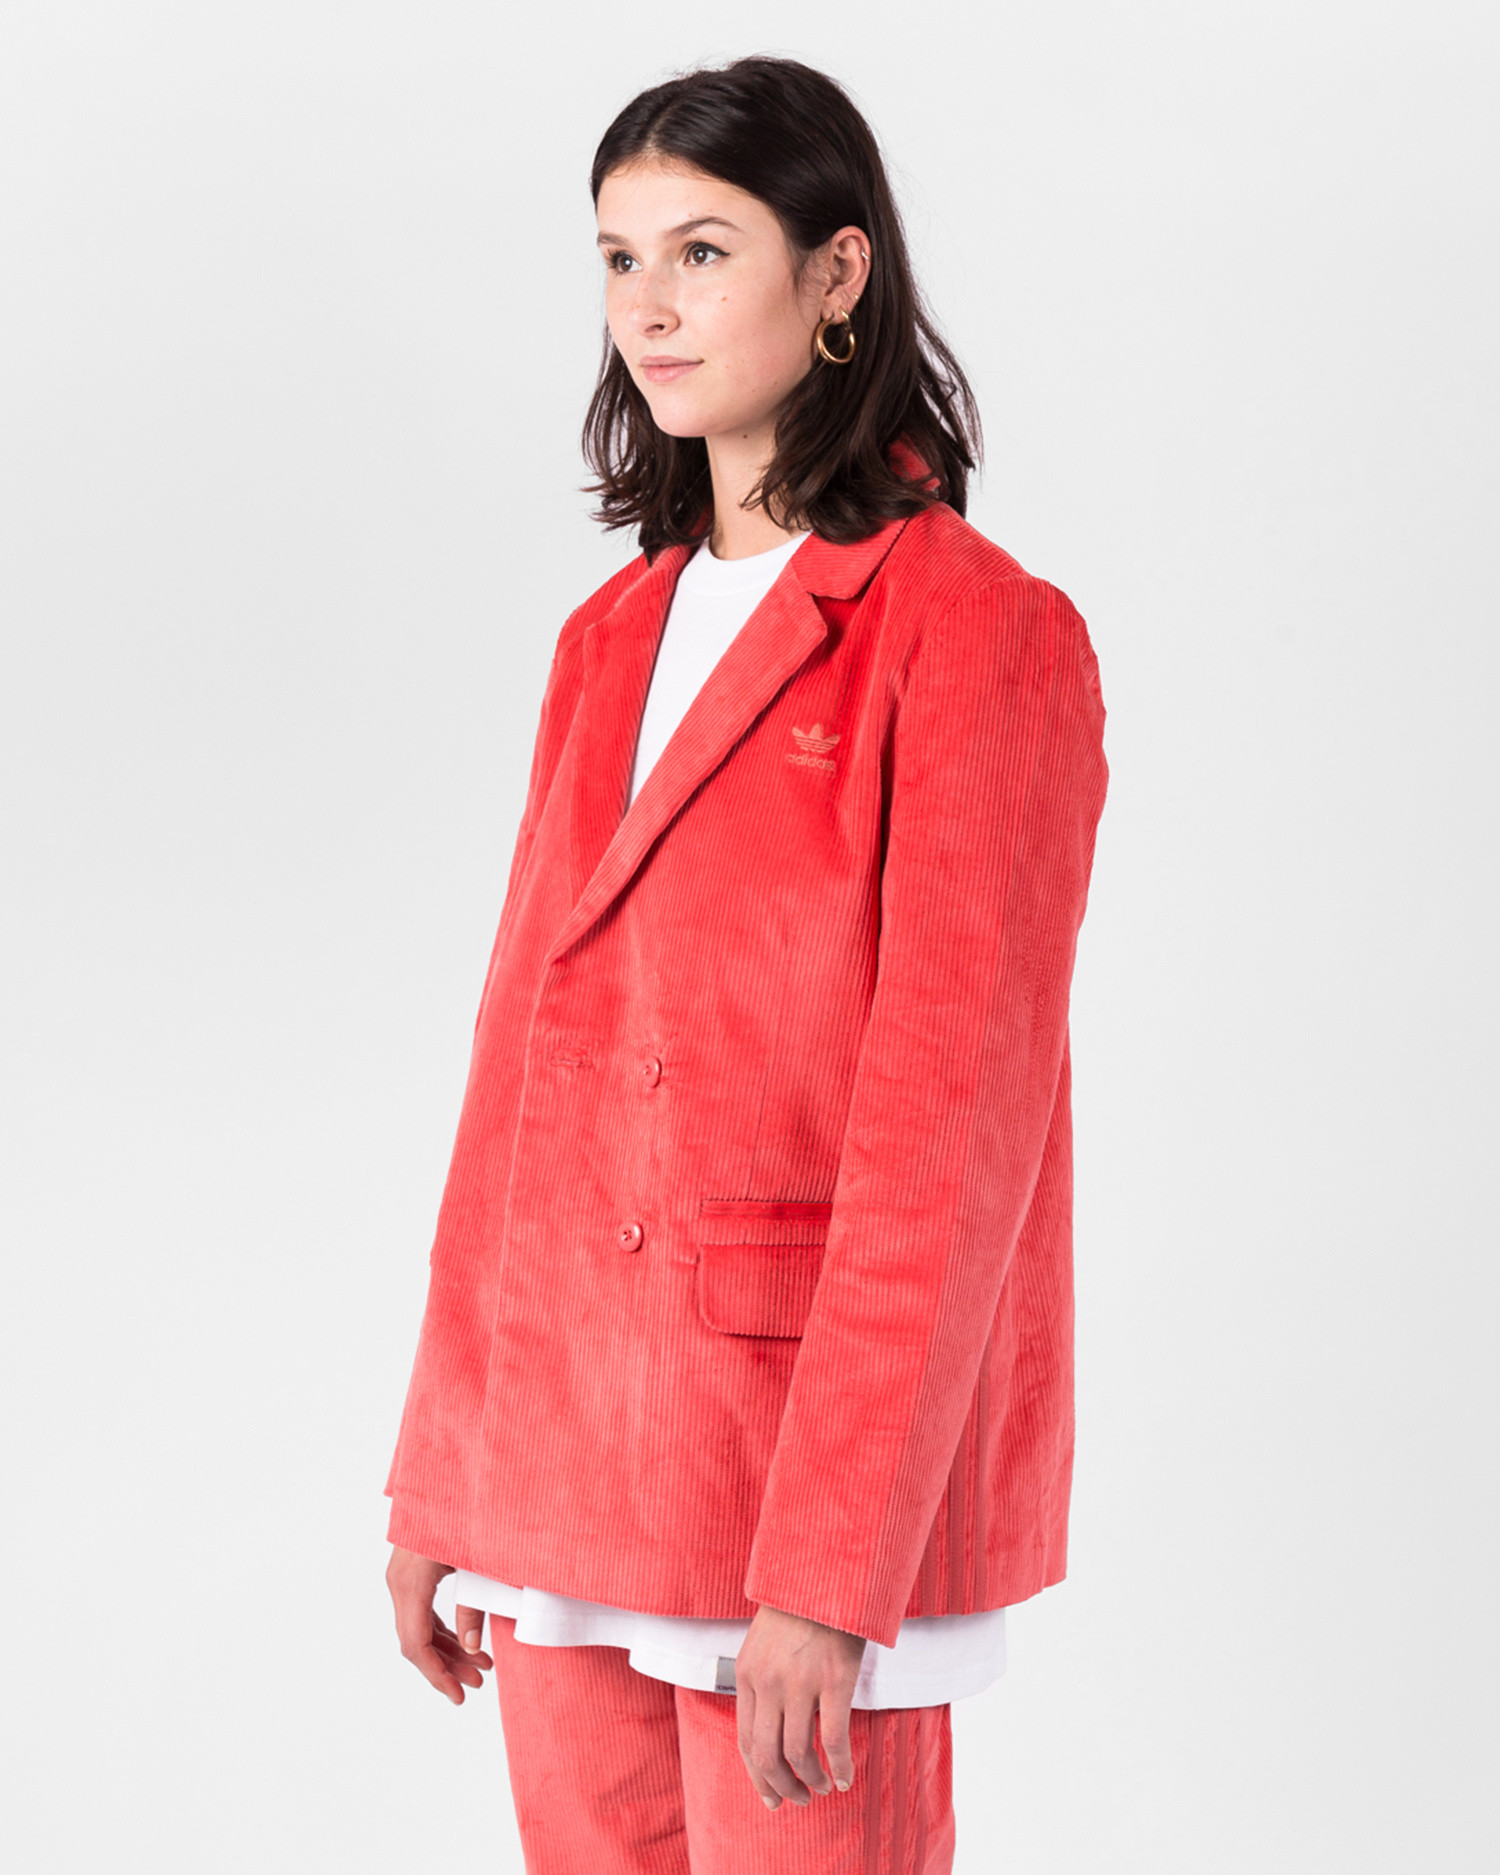 Adidas Blazer Tacticle Pink